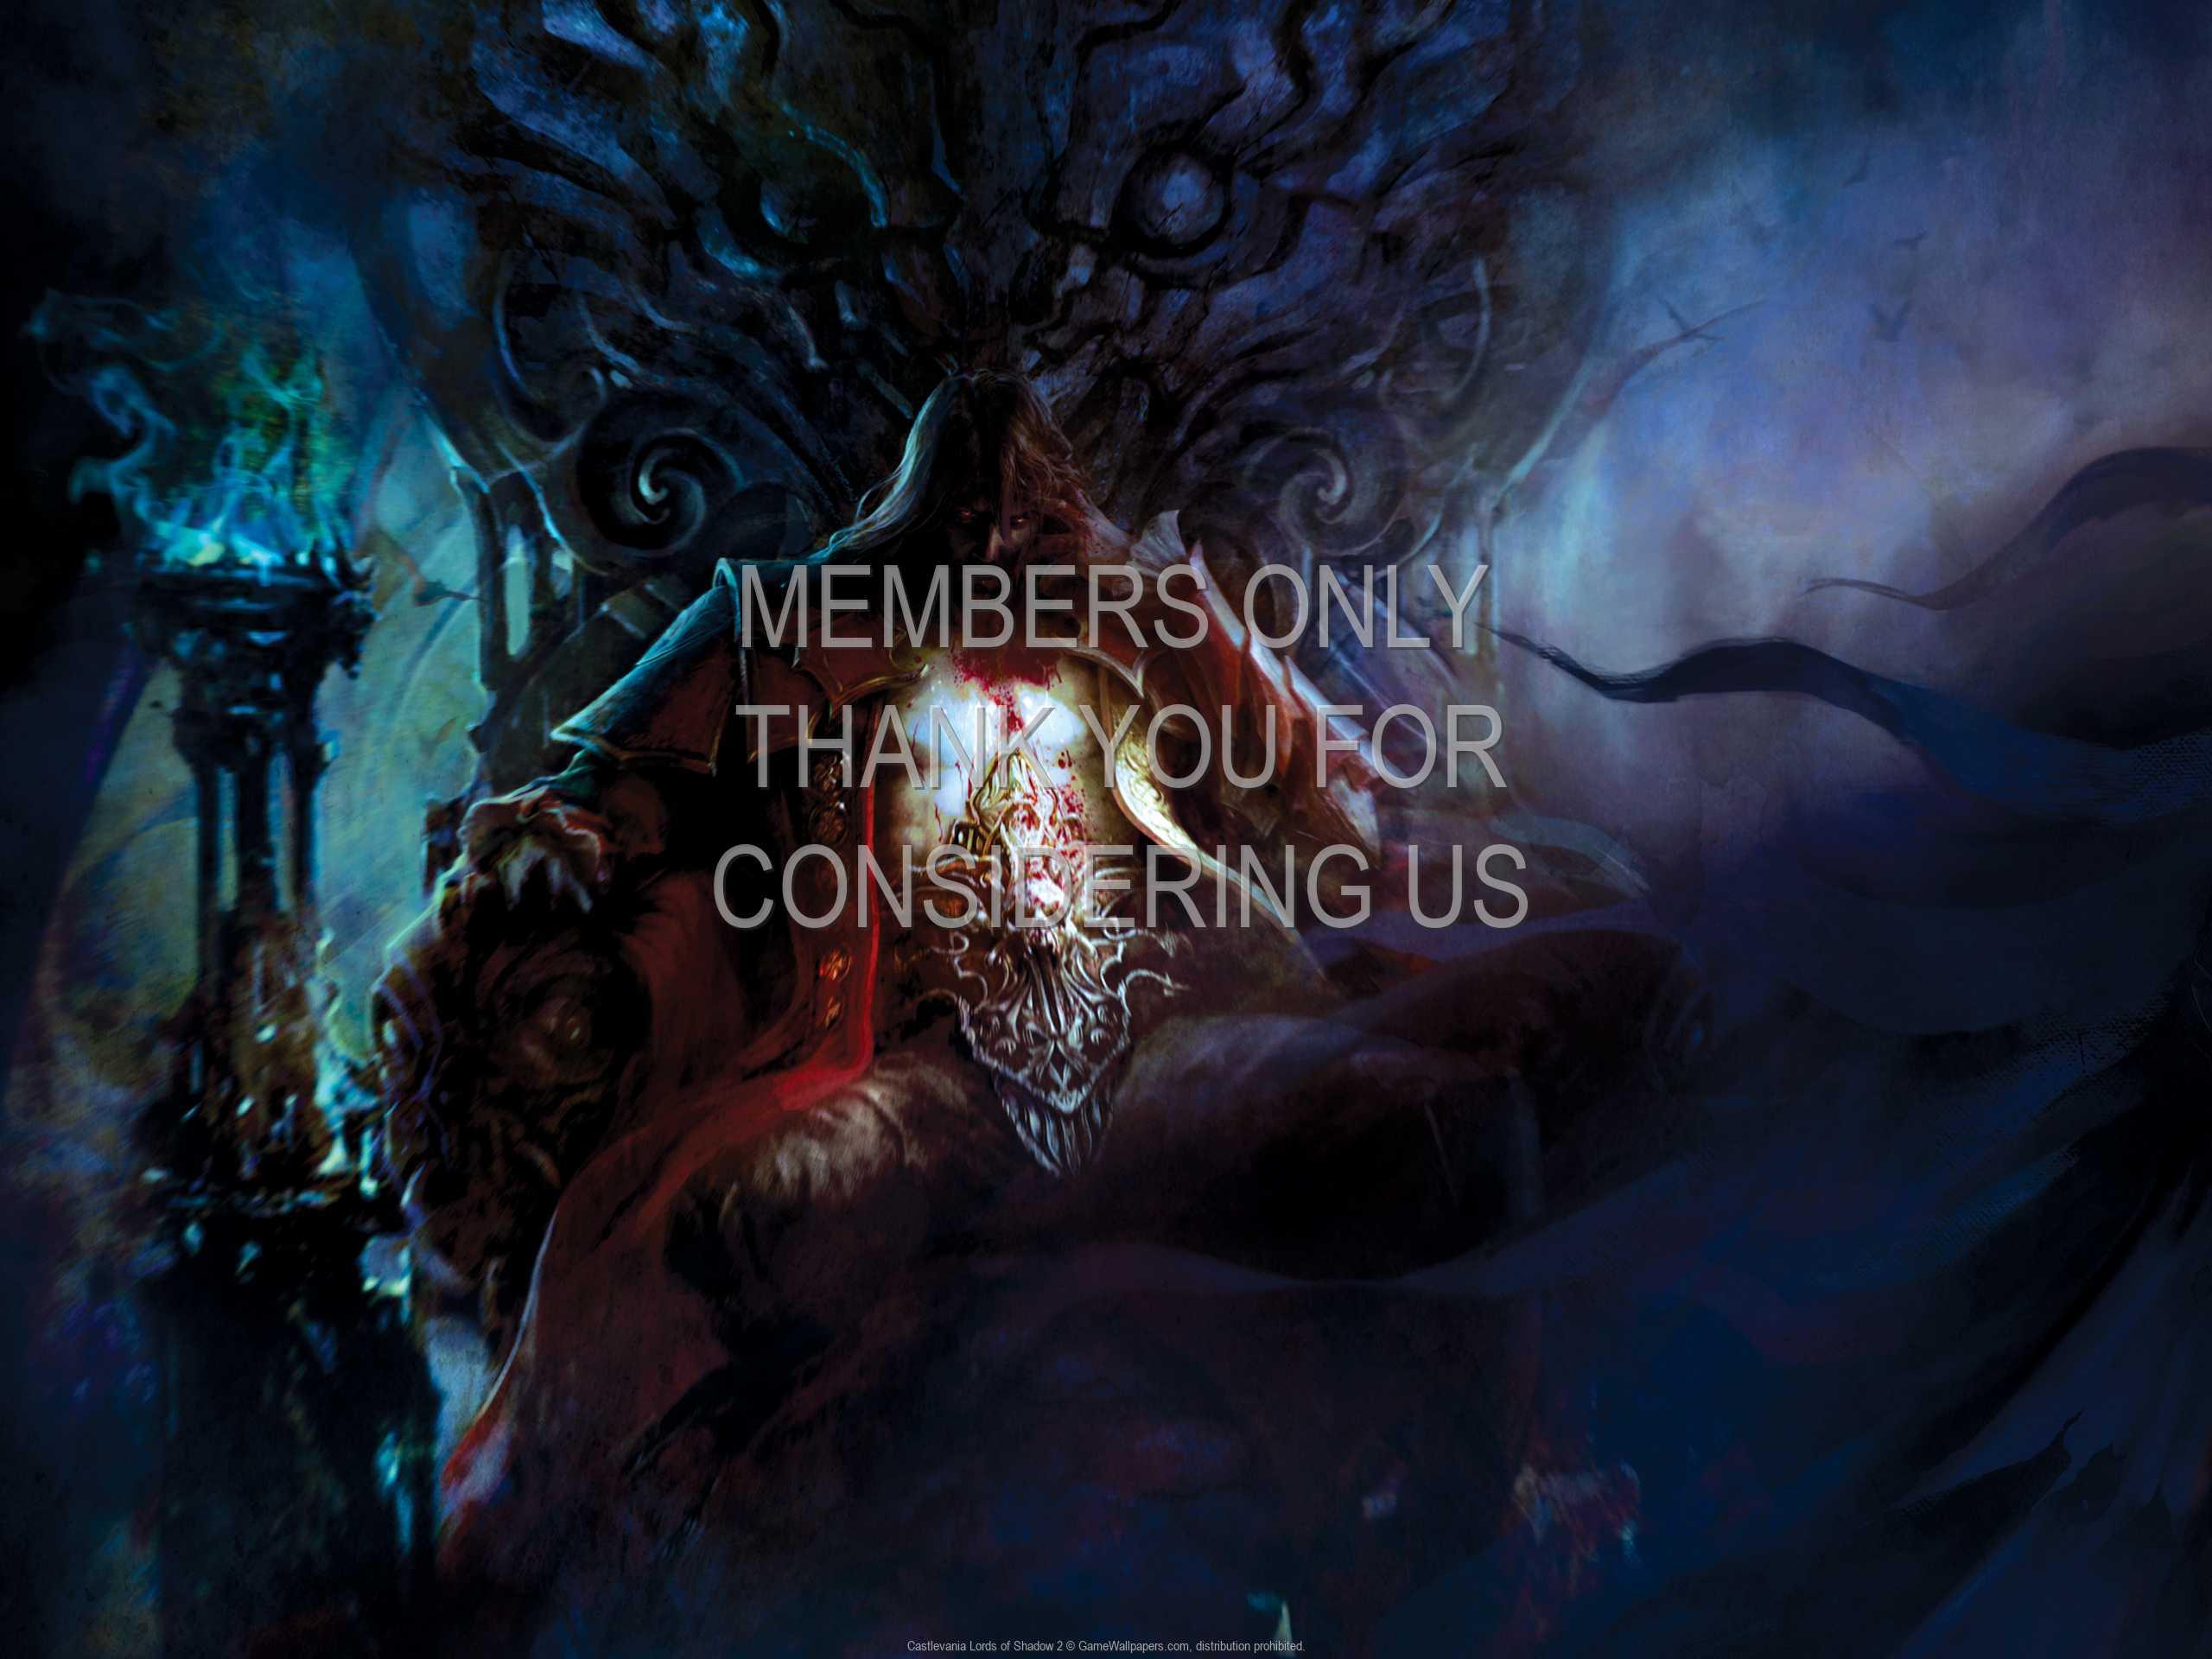 Castlevania: Lords of Shadow 2 1080p Horizontal Handy Hintergrundbild 04